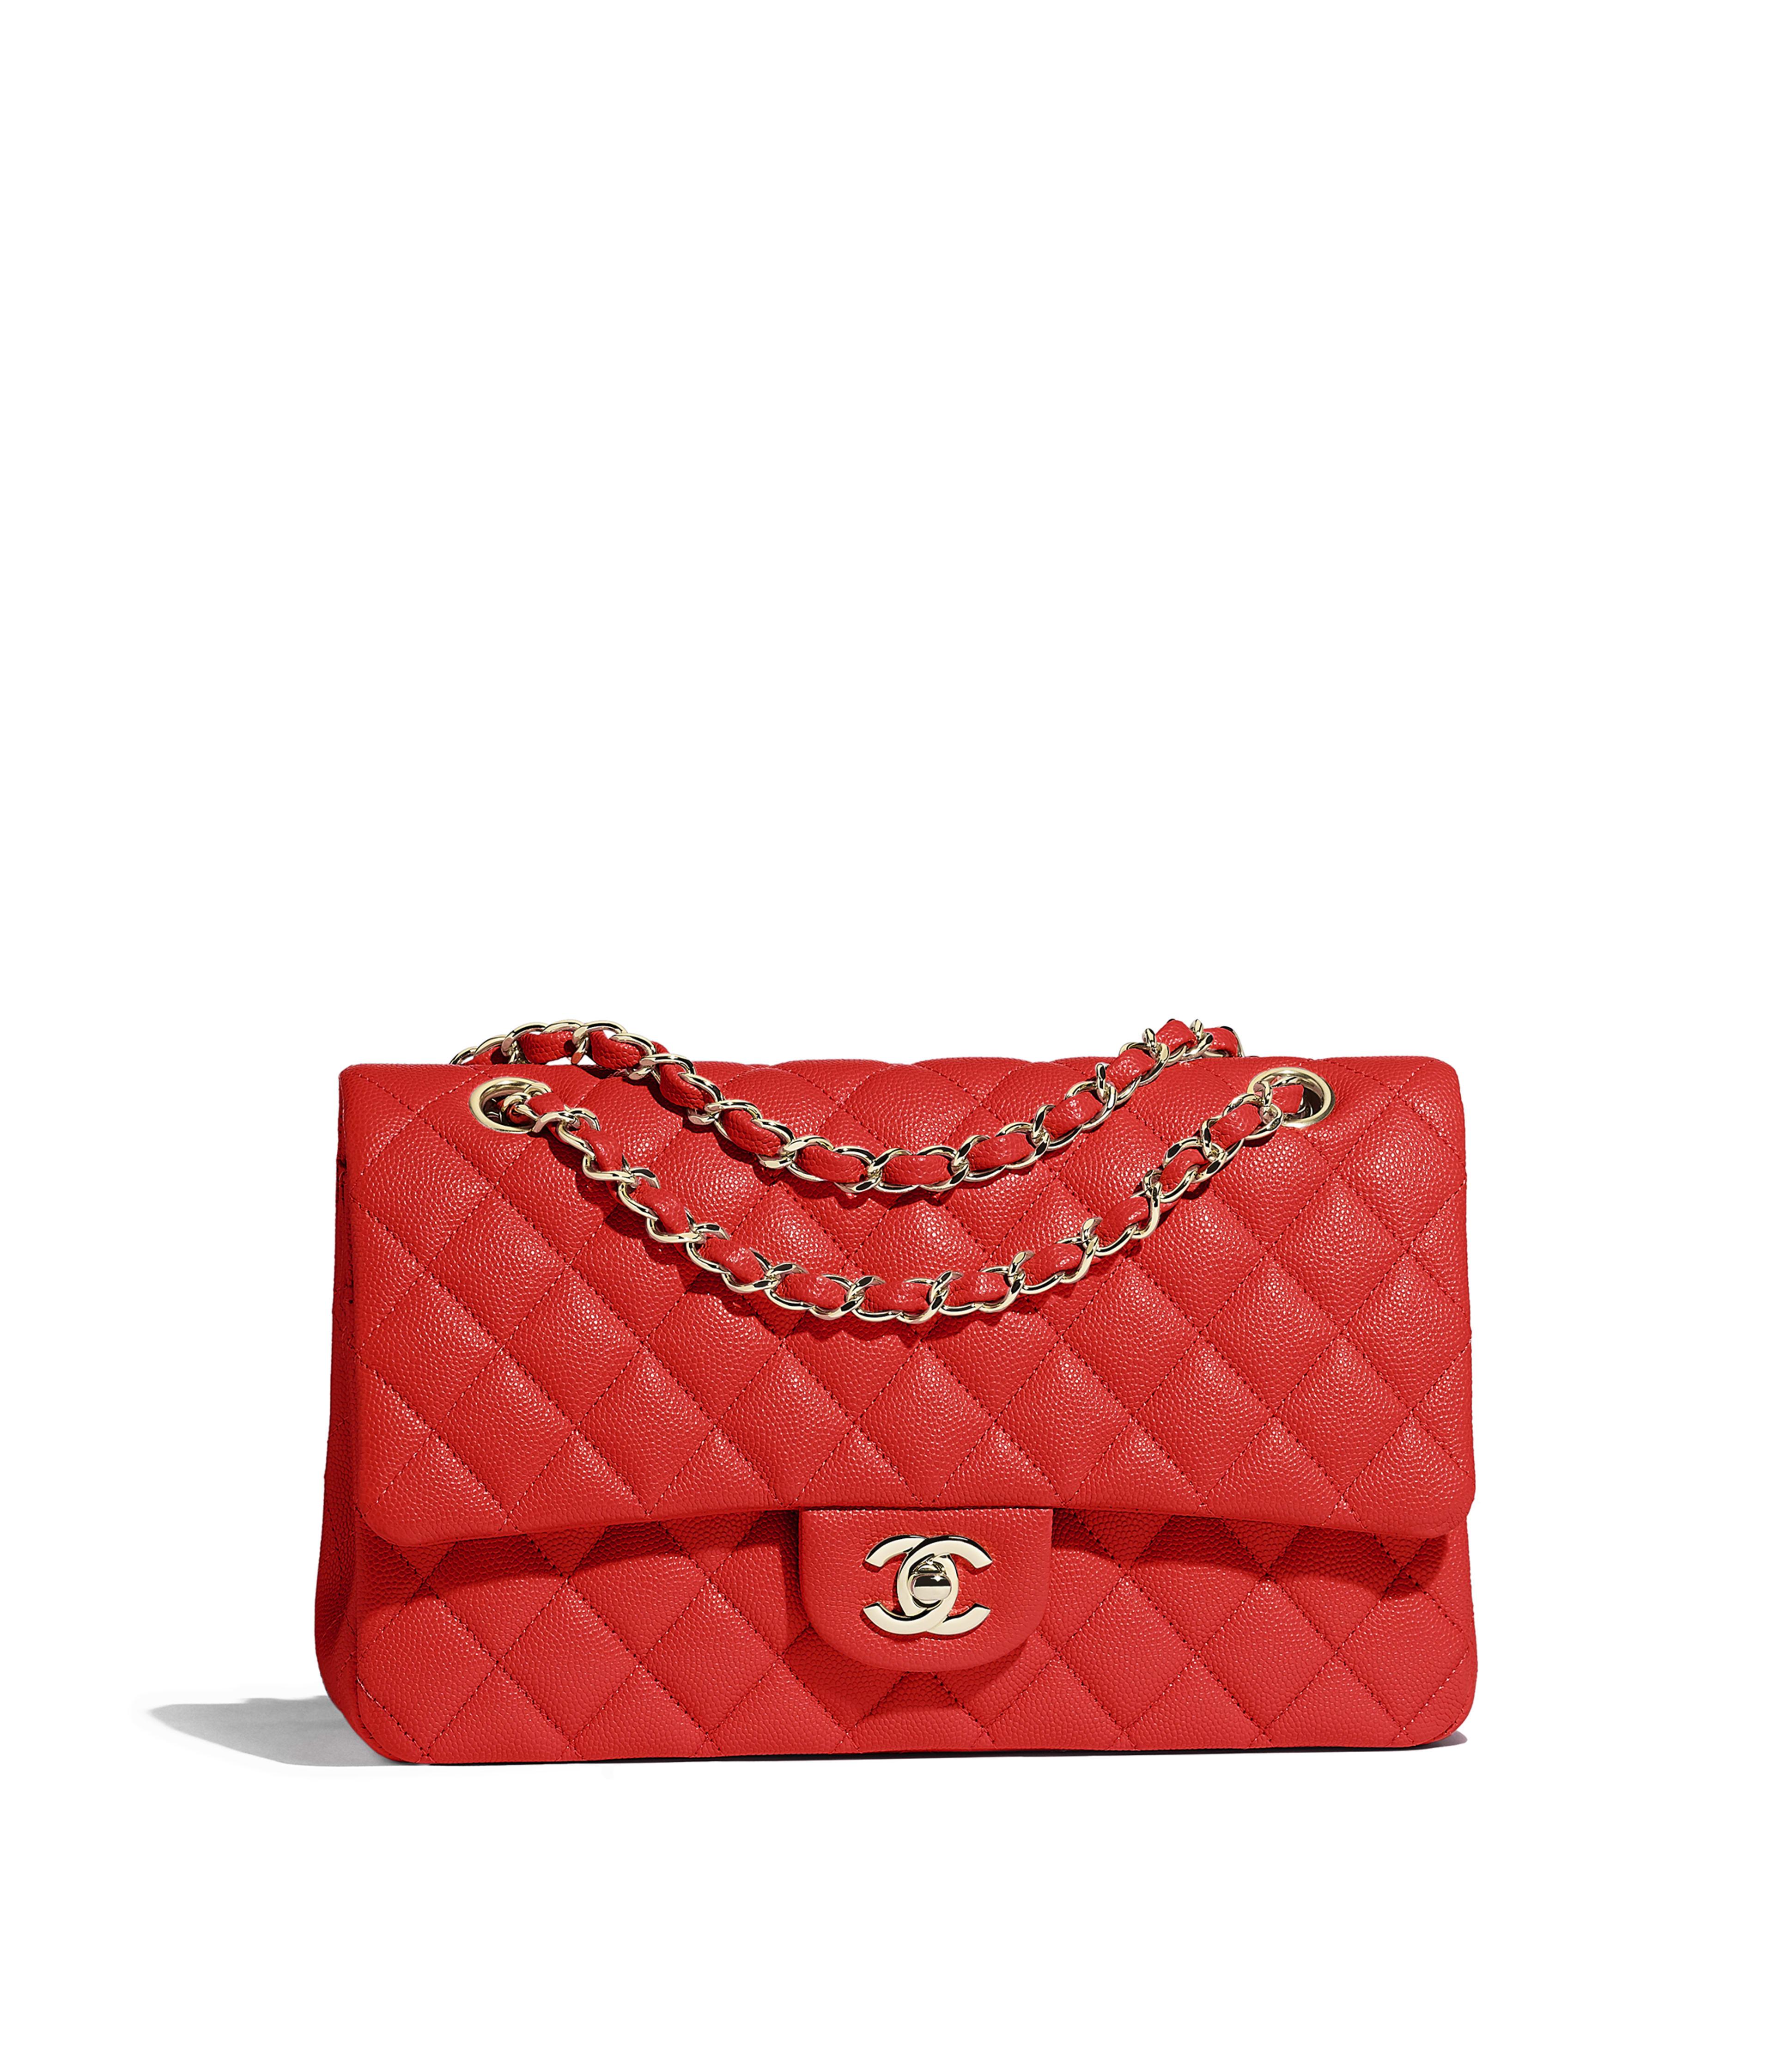 1483488b165f Classic - Handbags